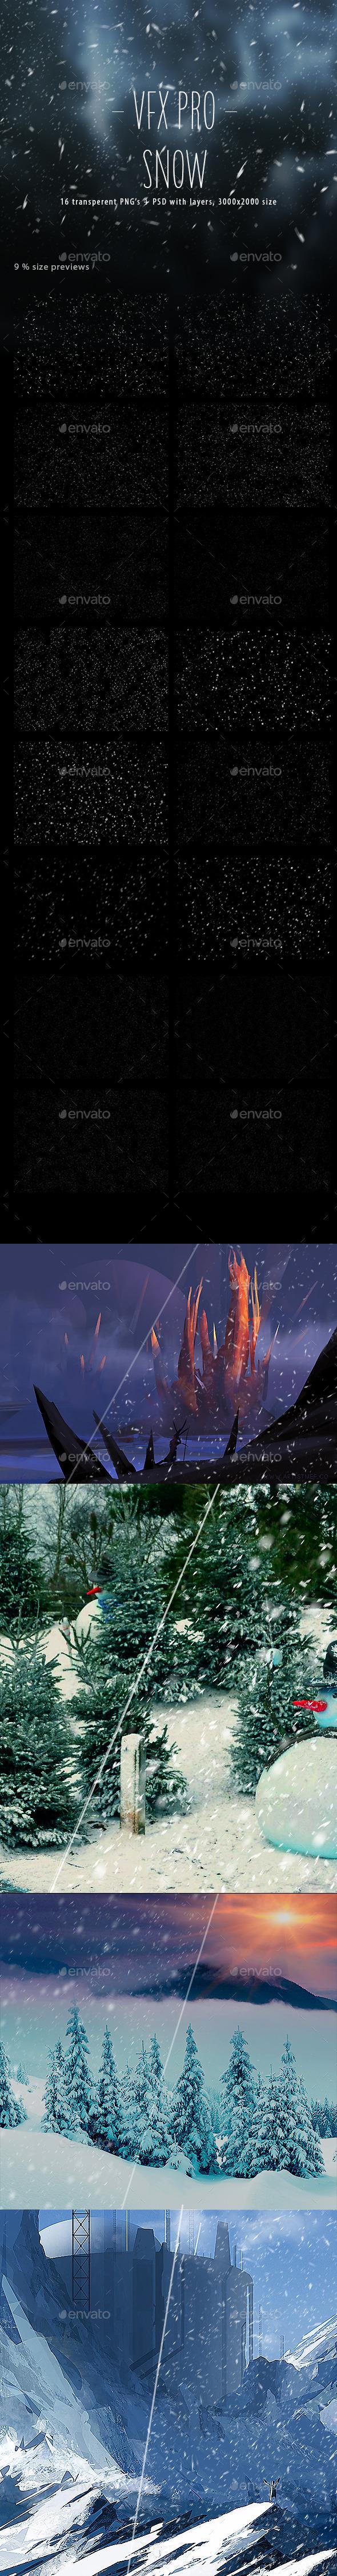 GraphicRiver VFX PRO Snow 9644905